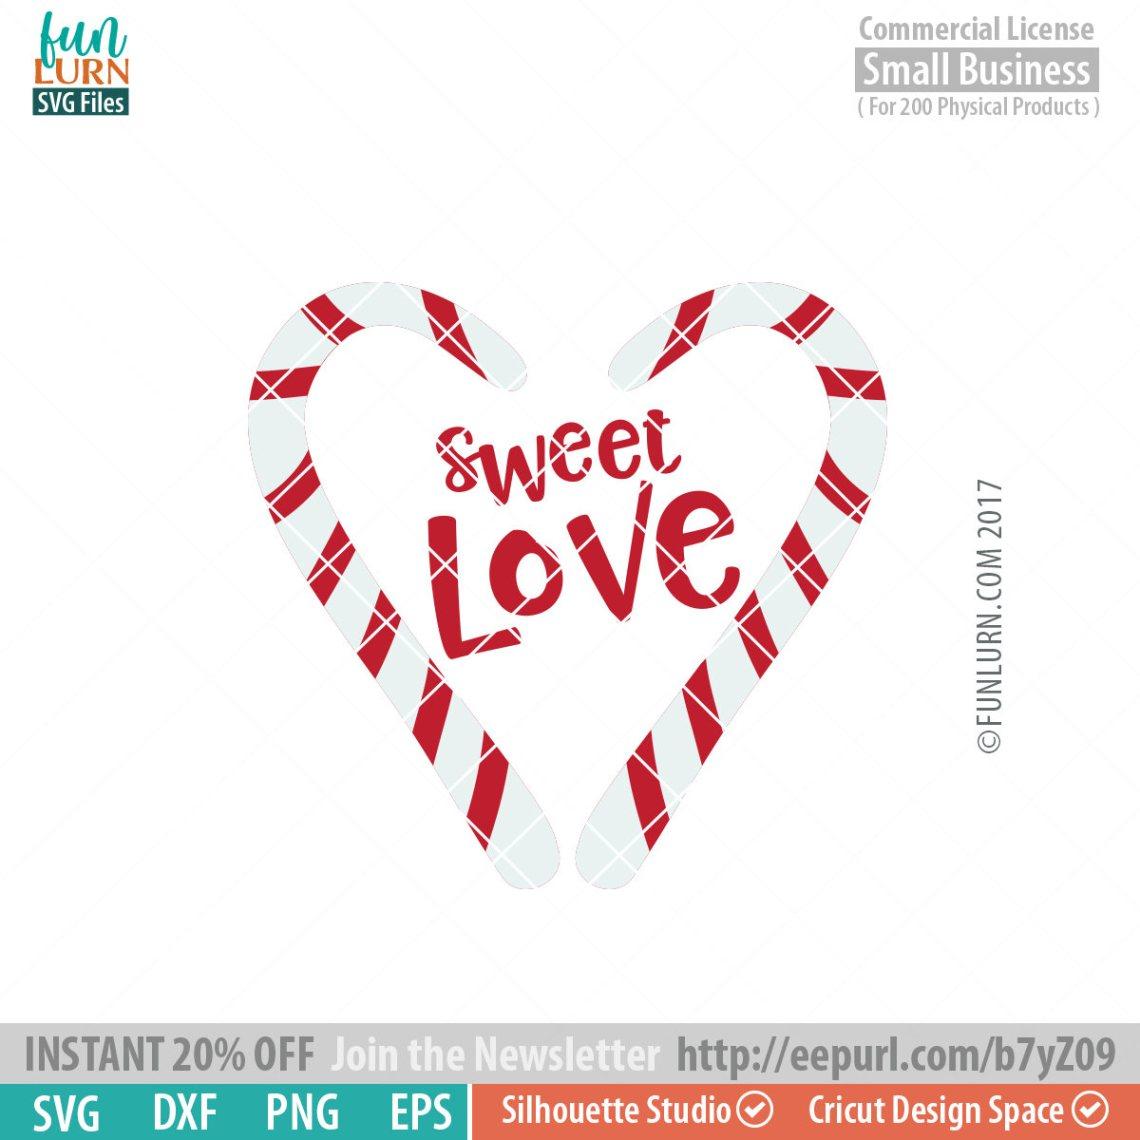 Download Sweet Love svg - FunLurn